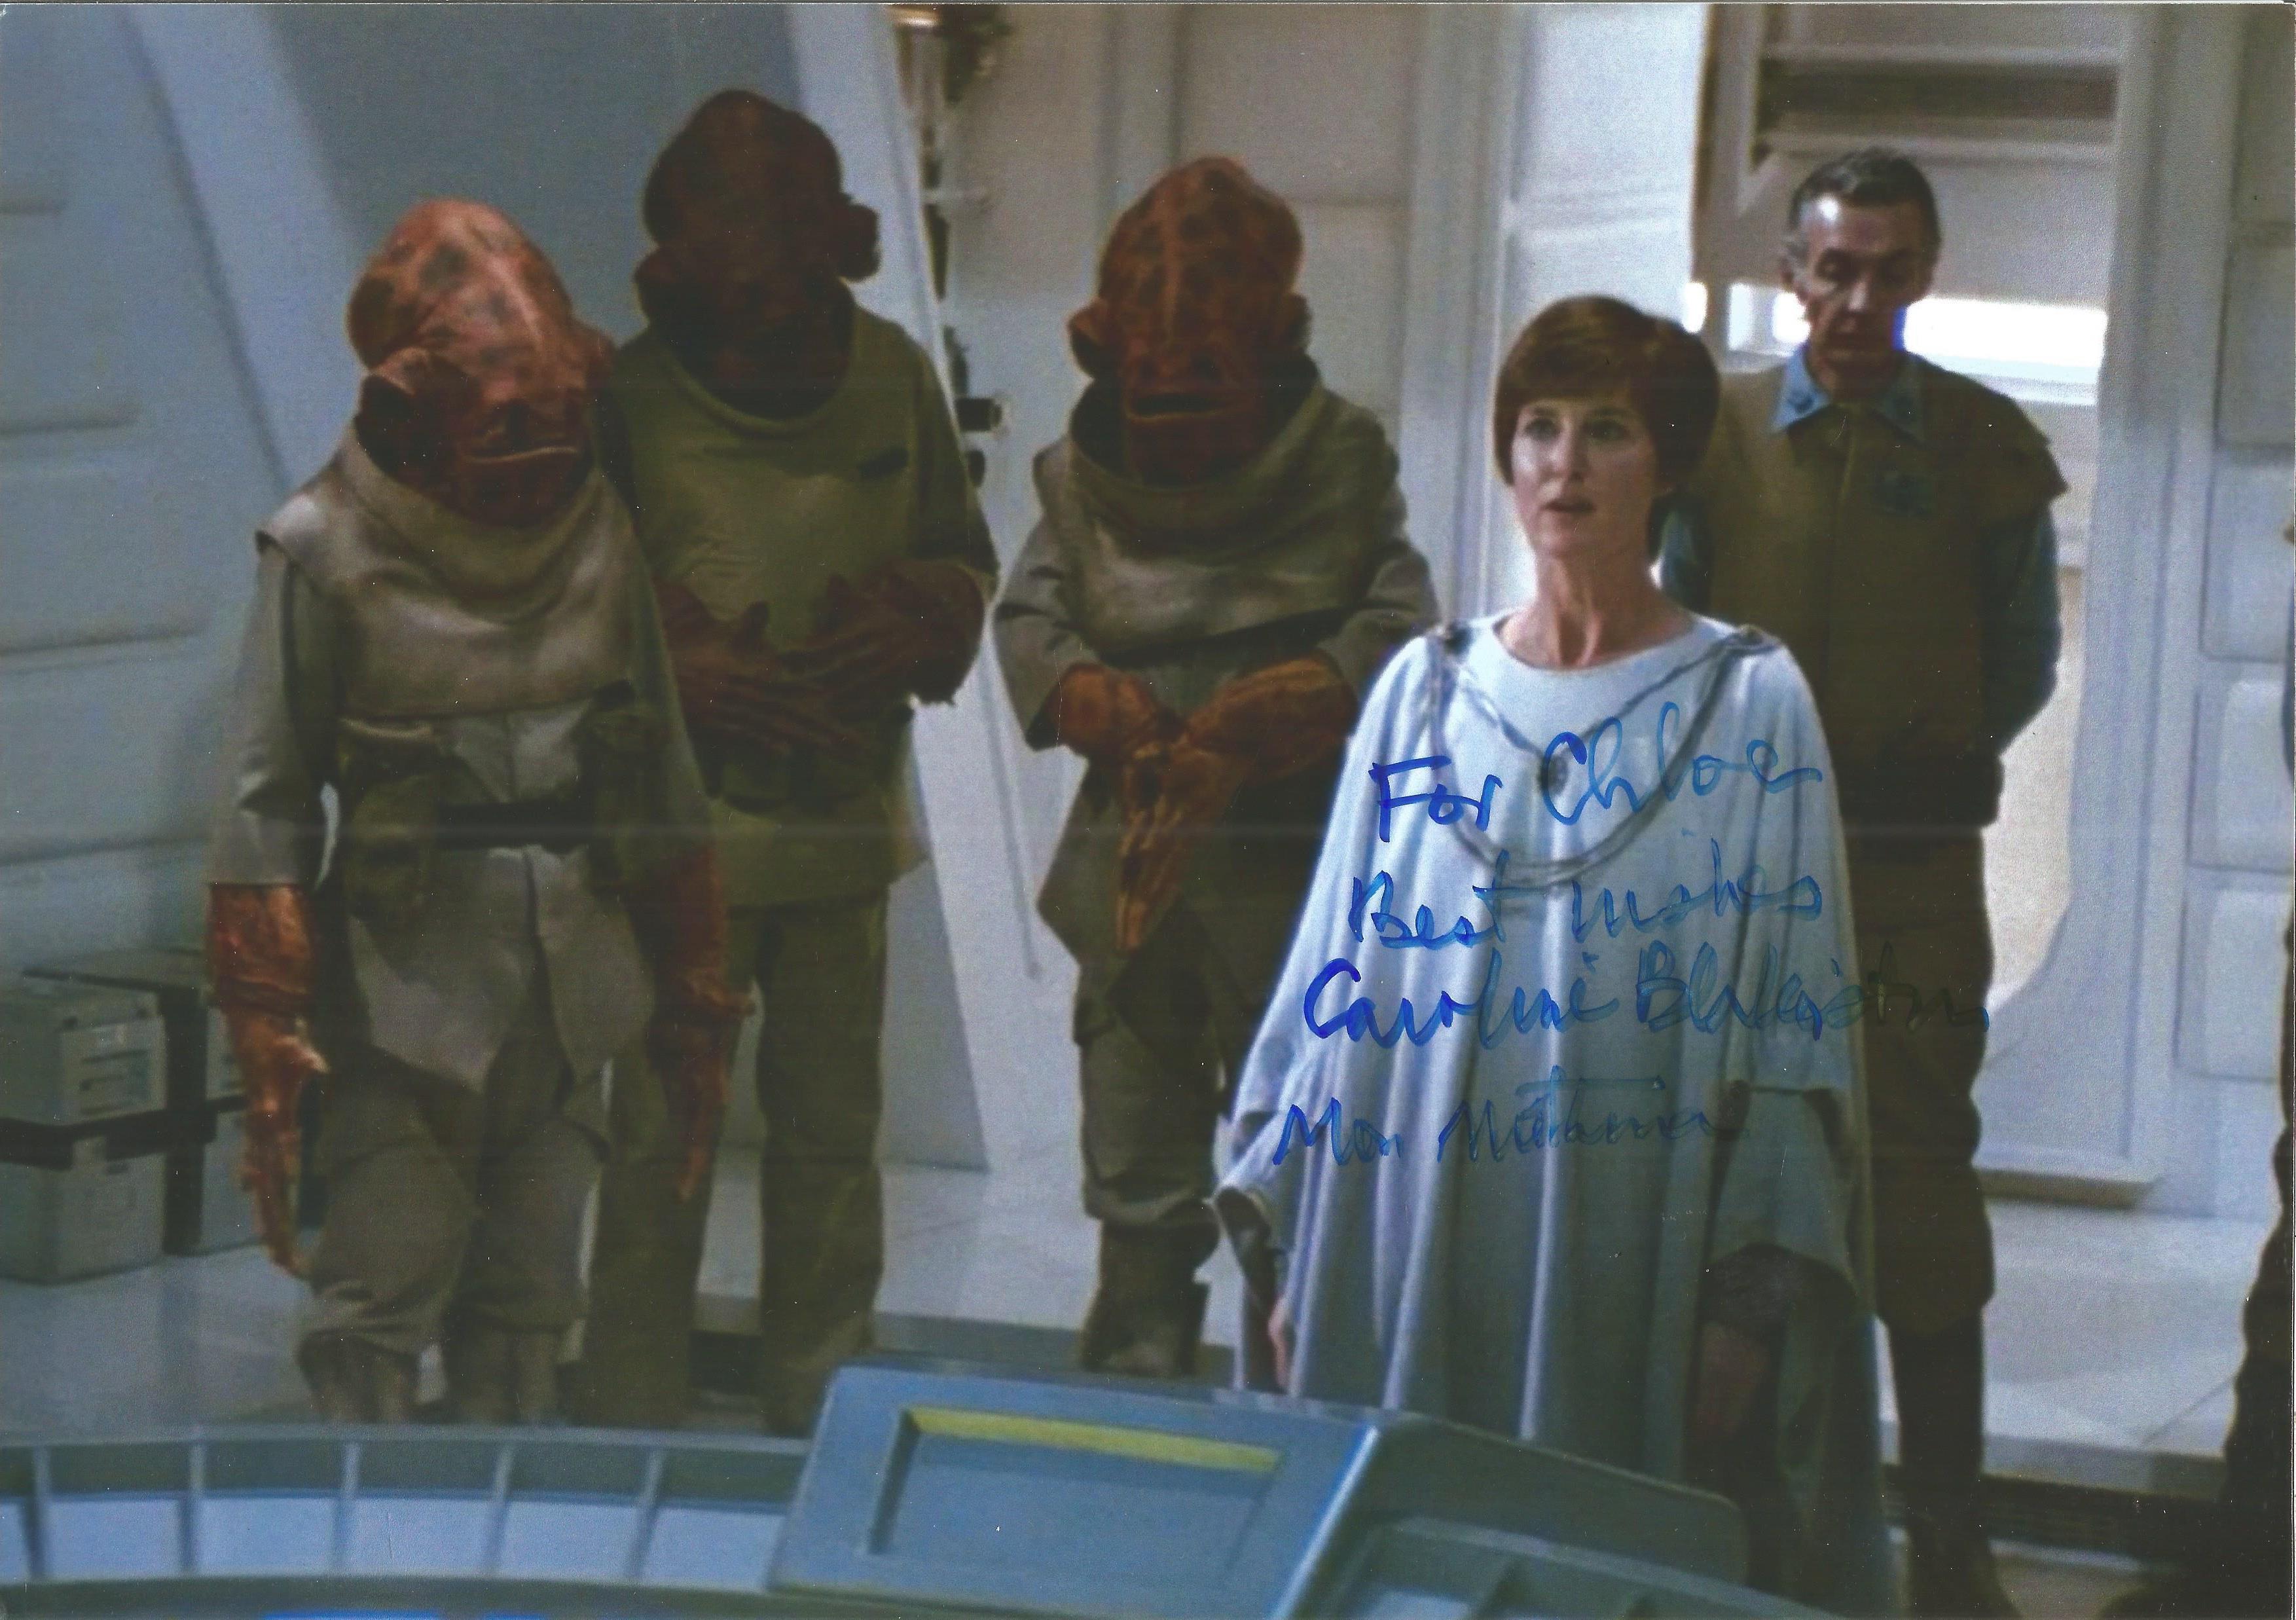 Caroline Blakiston Star Wars signed 11 x 8 colour photo (dedicated). Good condition. Good condition.